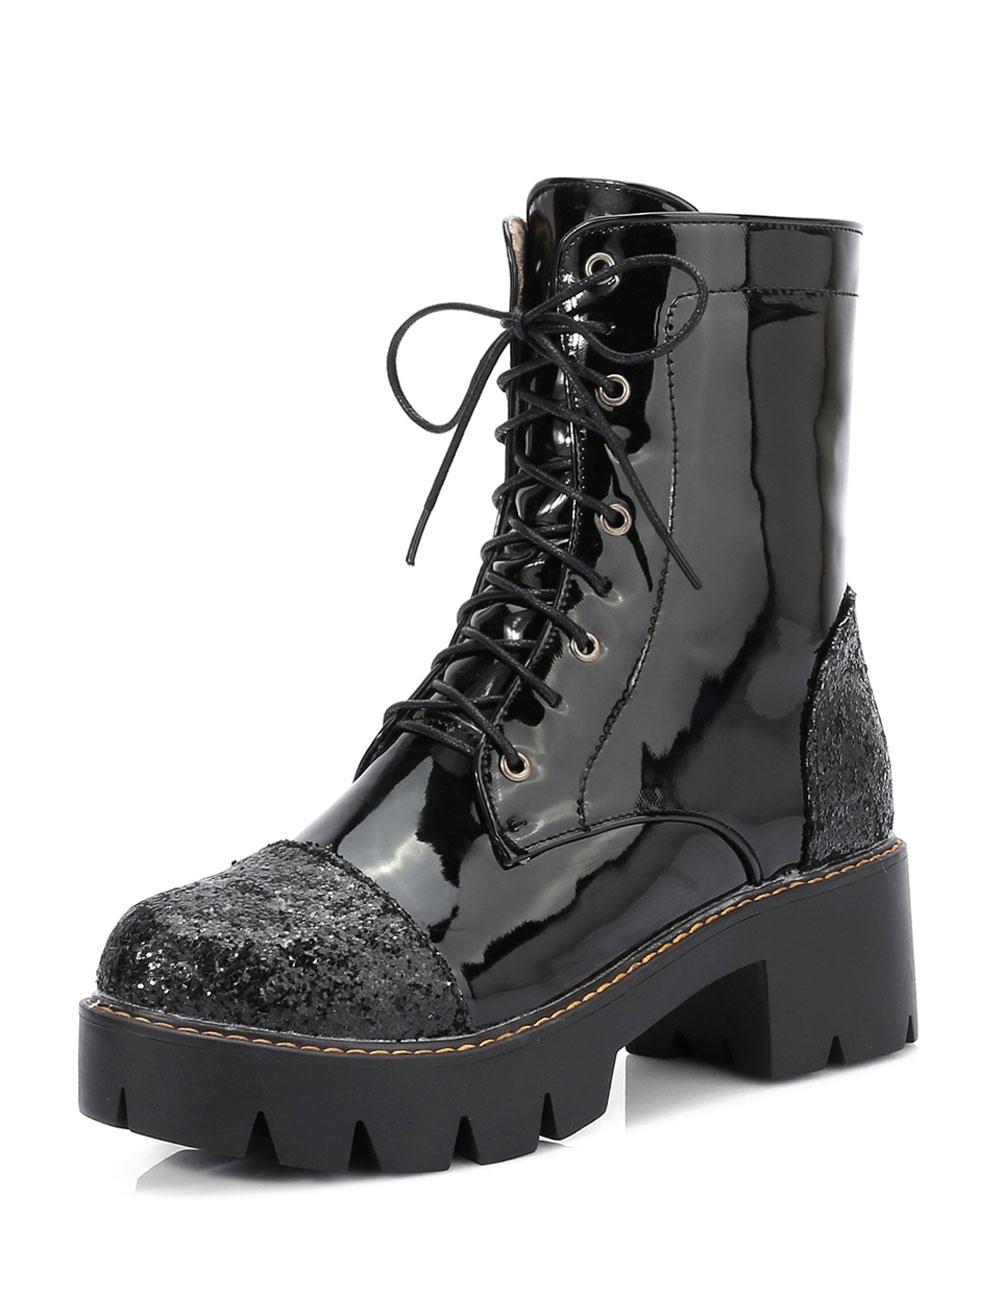 round toe combat boots